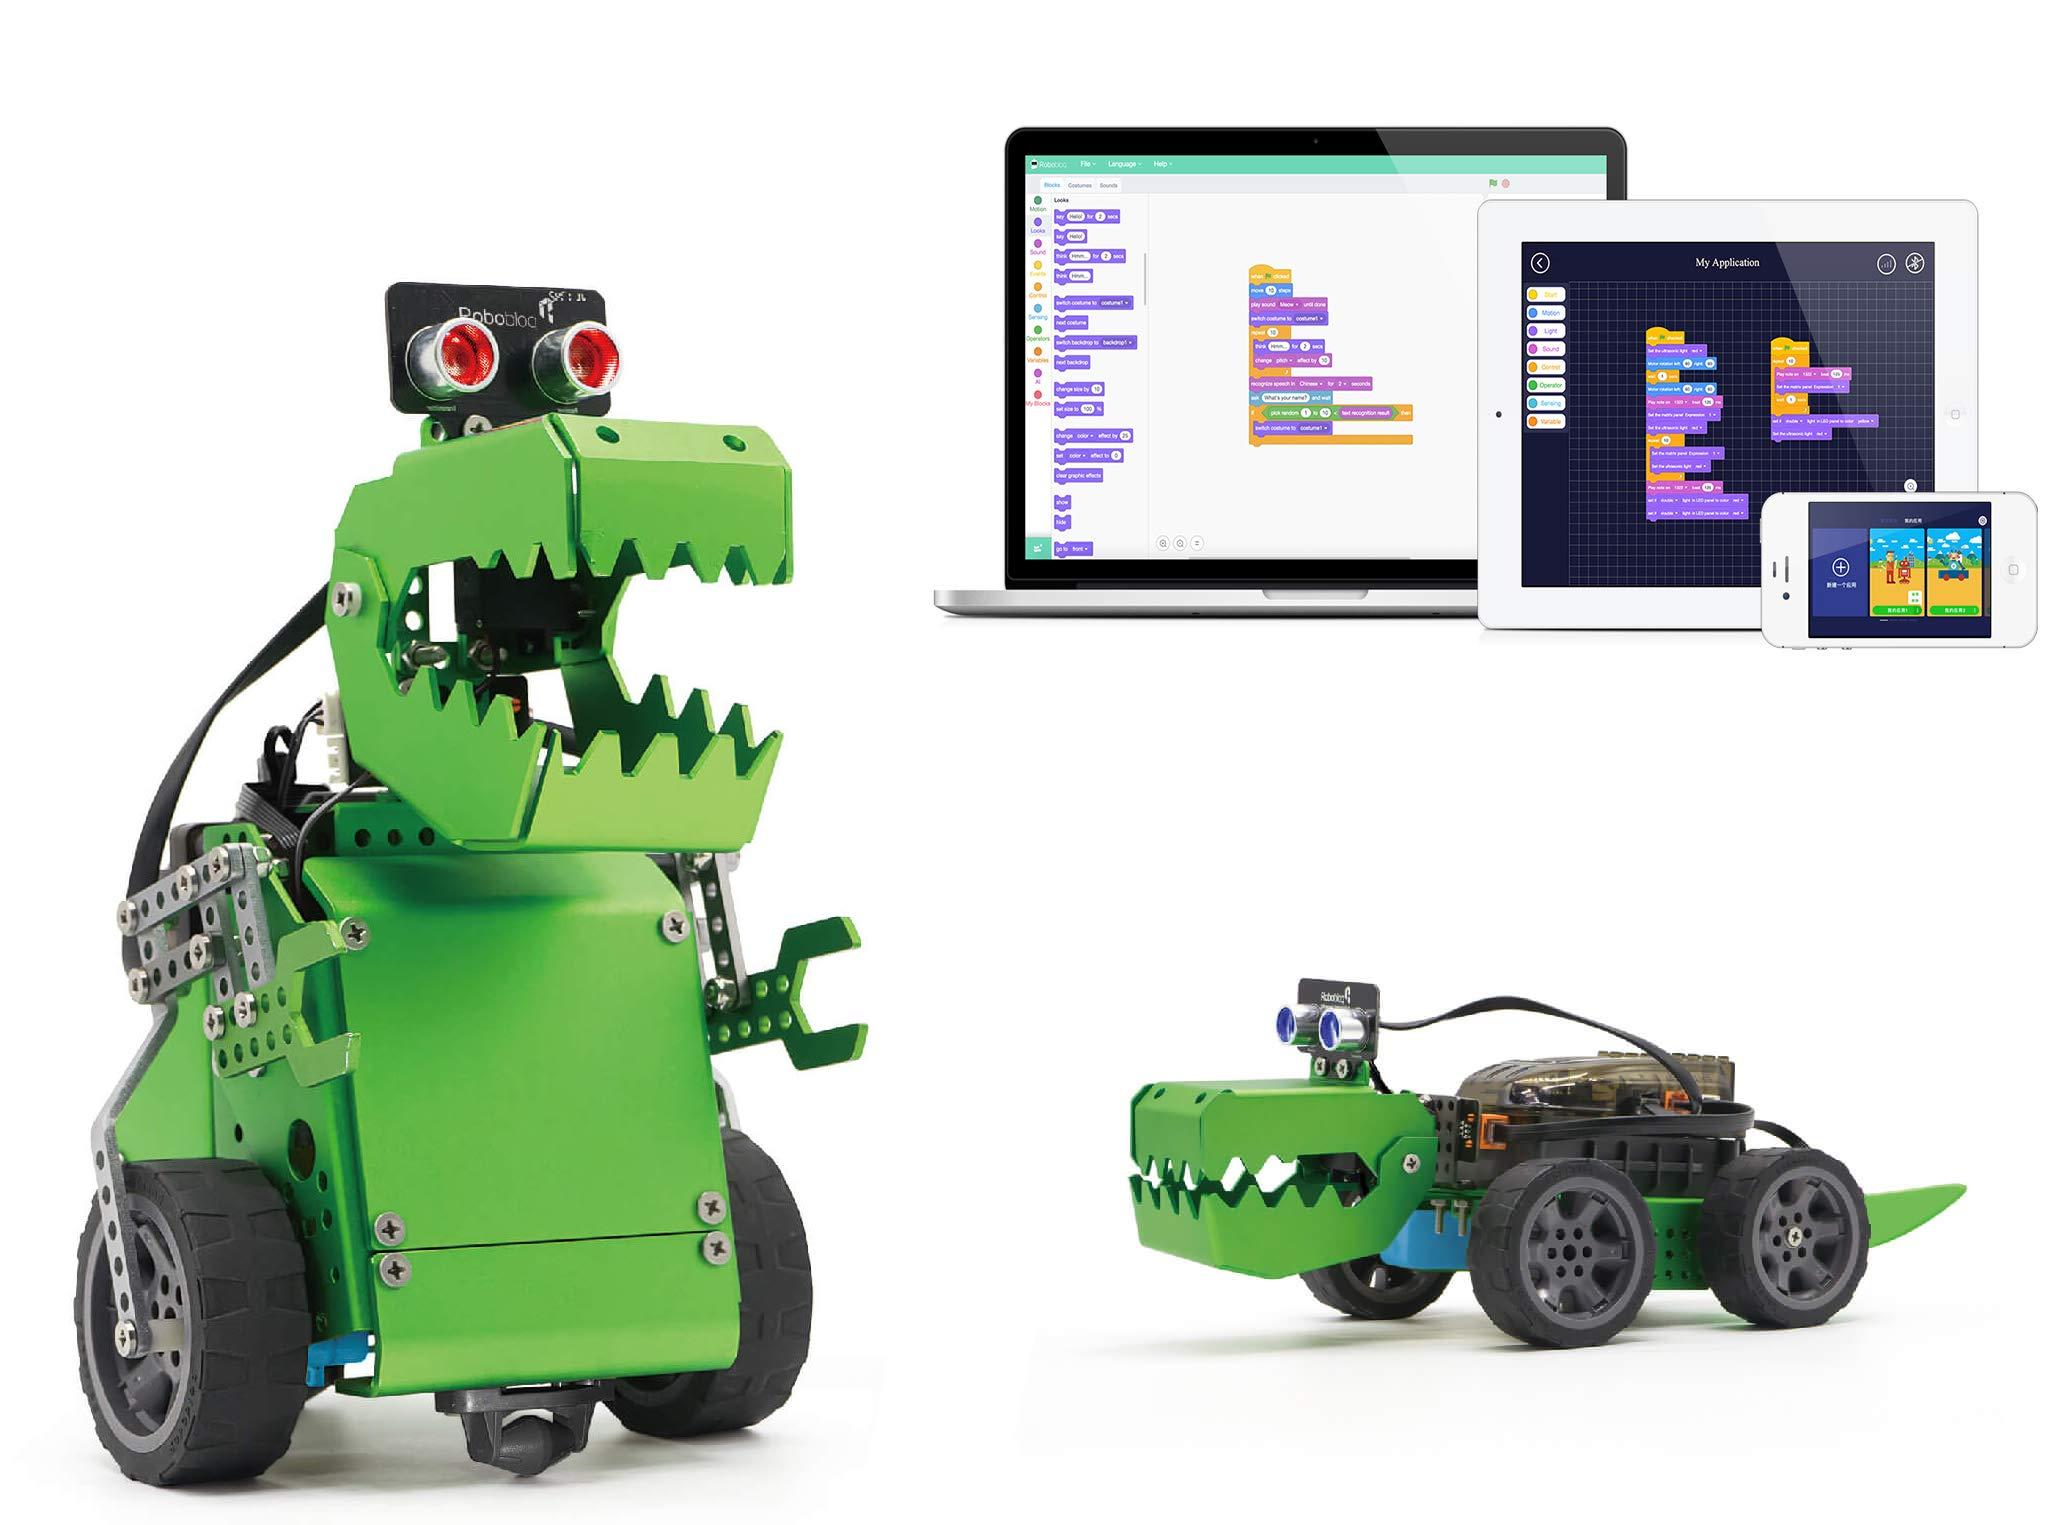 Robot Educativo para armar y programar en Arduino Robobloq a